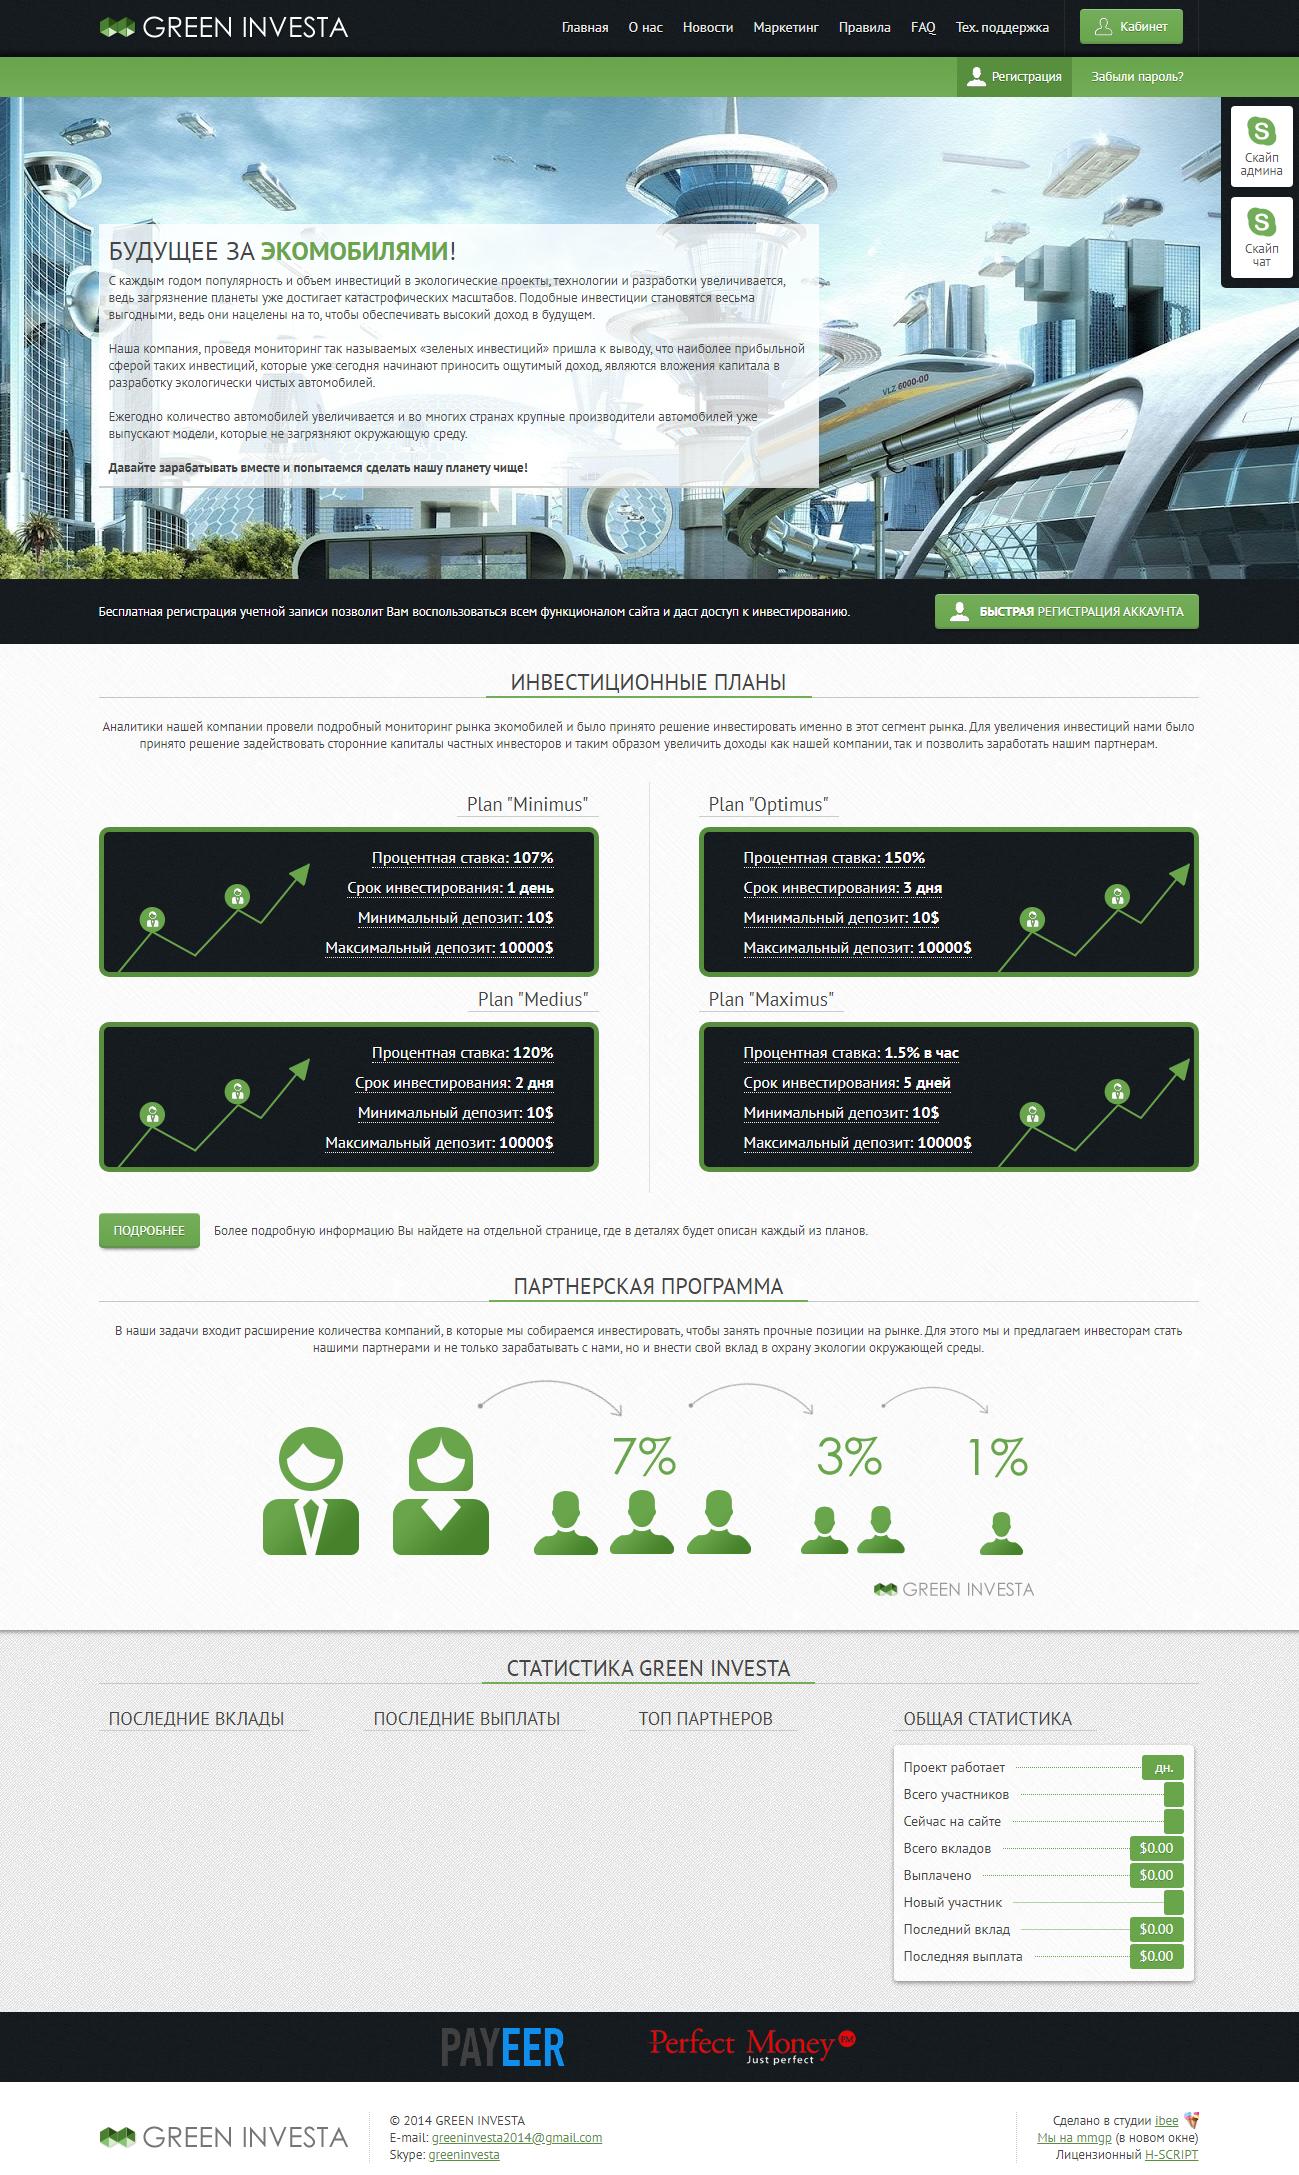 H-SCRIPT СКРИПТ Инвестиционного проекта Green Investa